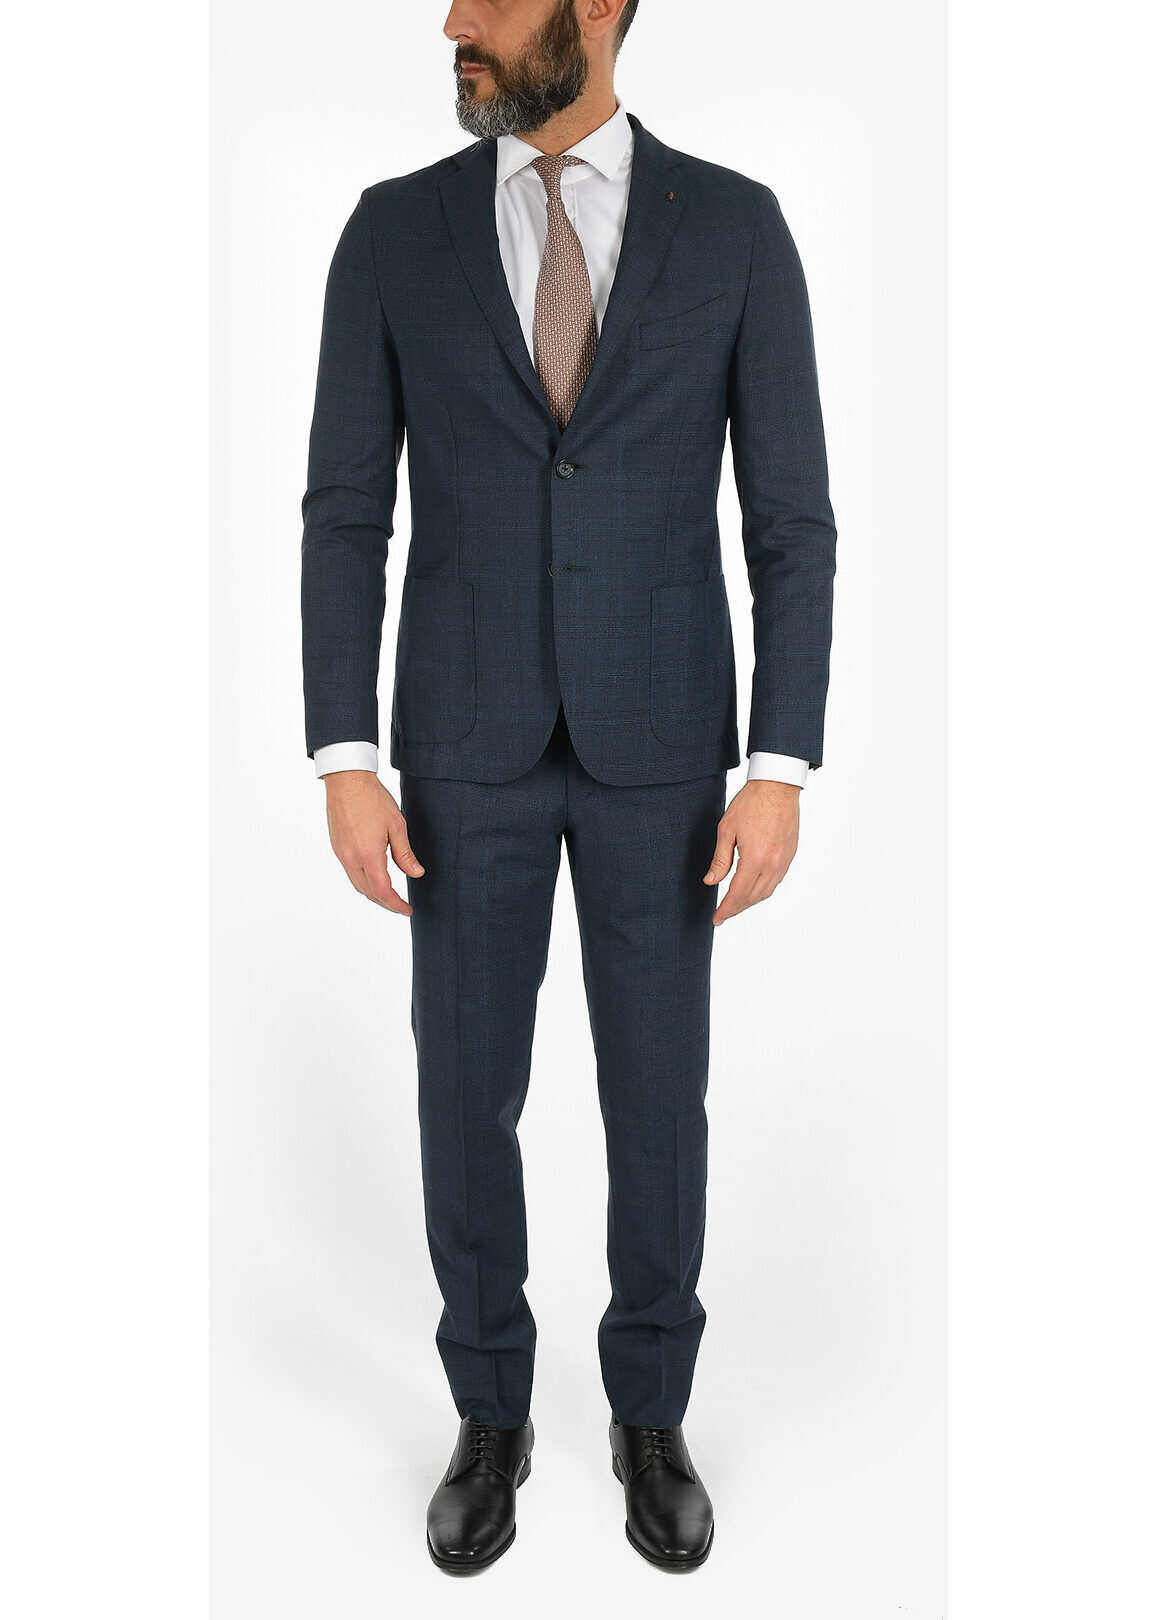 CORNELIANI CC COLLECTION REWARD 3-button suit BLUE imagine